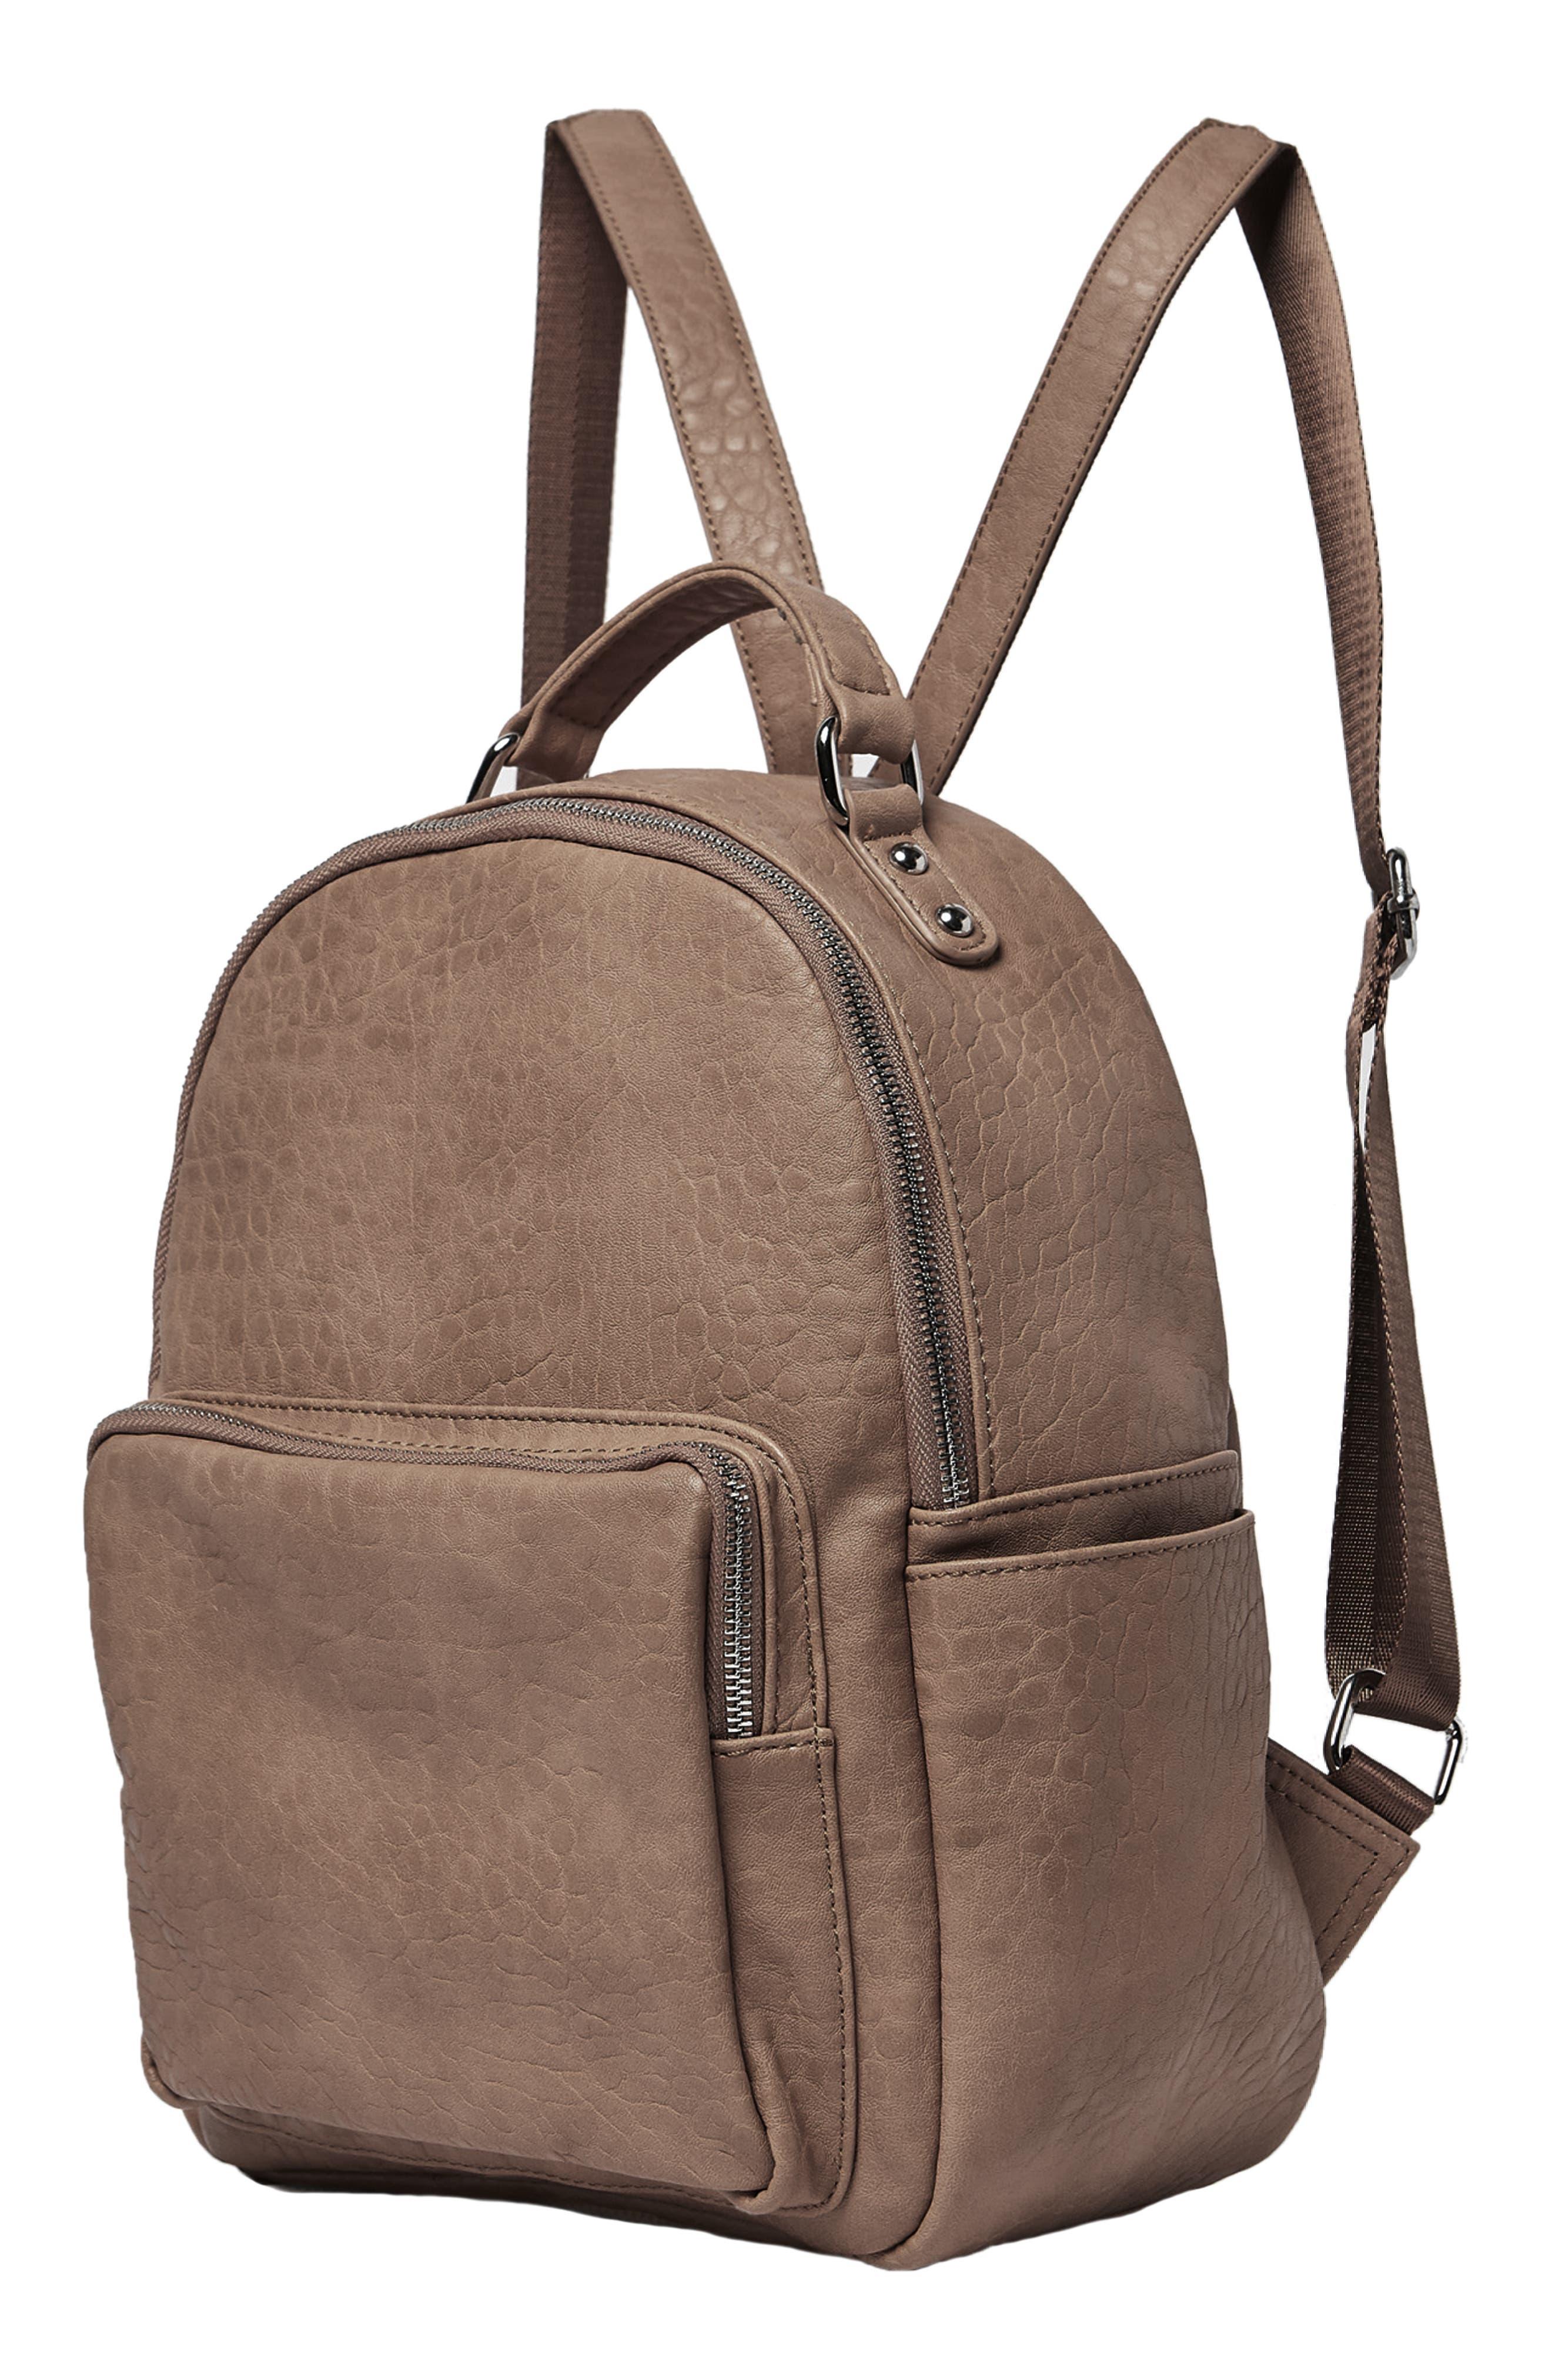 South Bag Vegan Leather Backpack,                             Alternate thumbnail 4, color,                             MOCHA